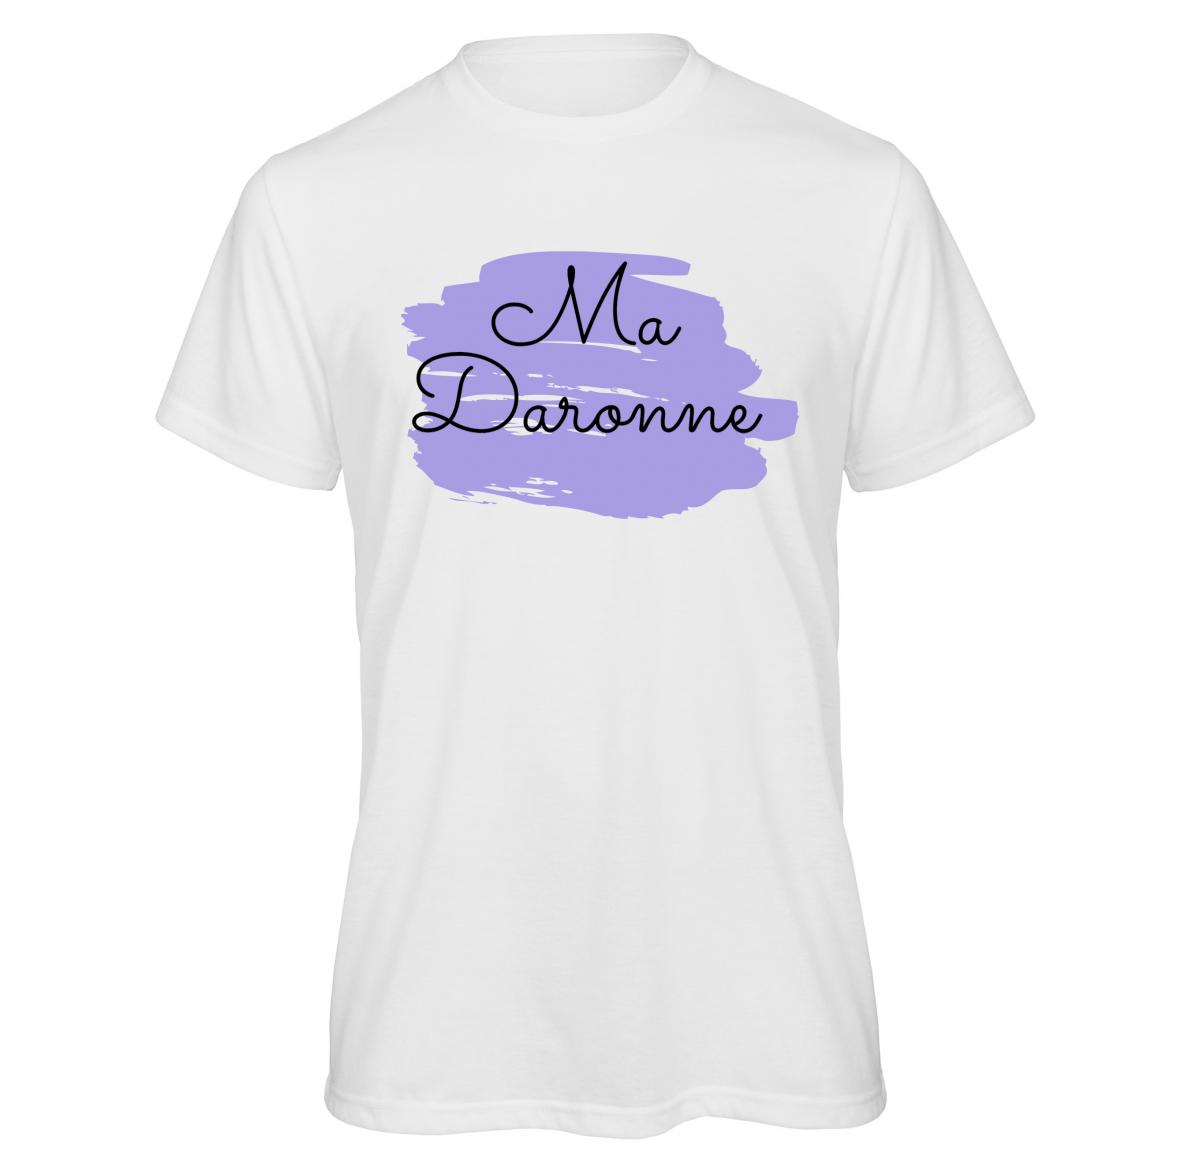 Tee-Shirt Homme Confort - Ma Daronne à Moi